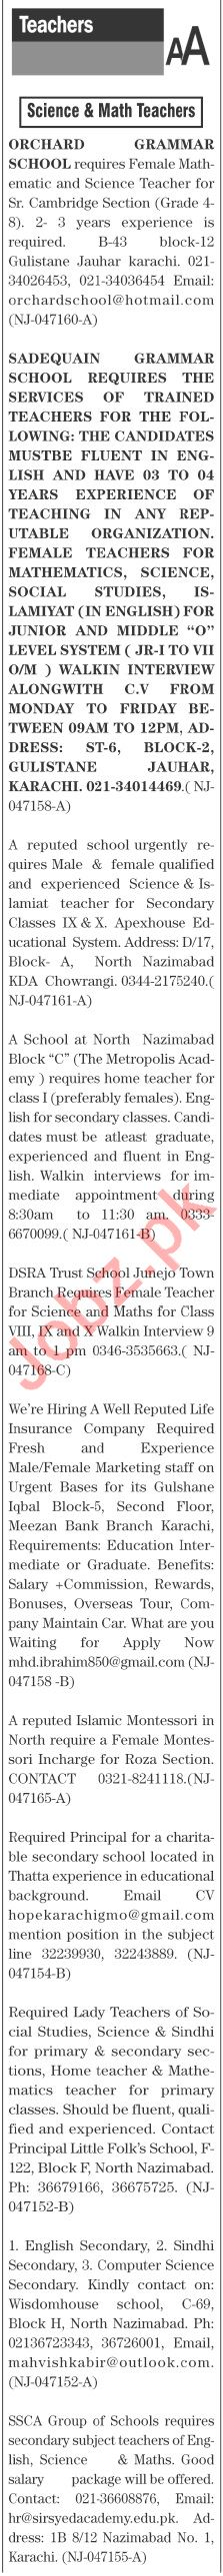 The News Sunday Classified Ads 19 Sep 2021 for Teachers